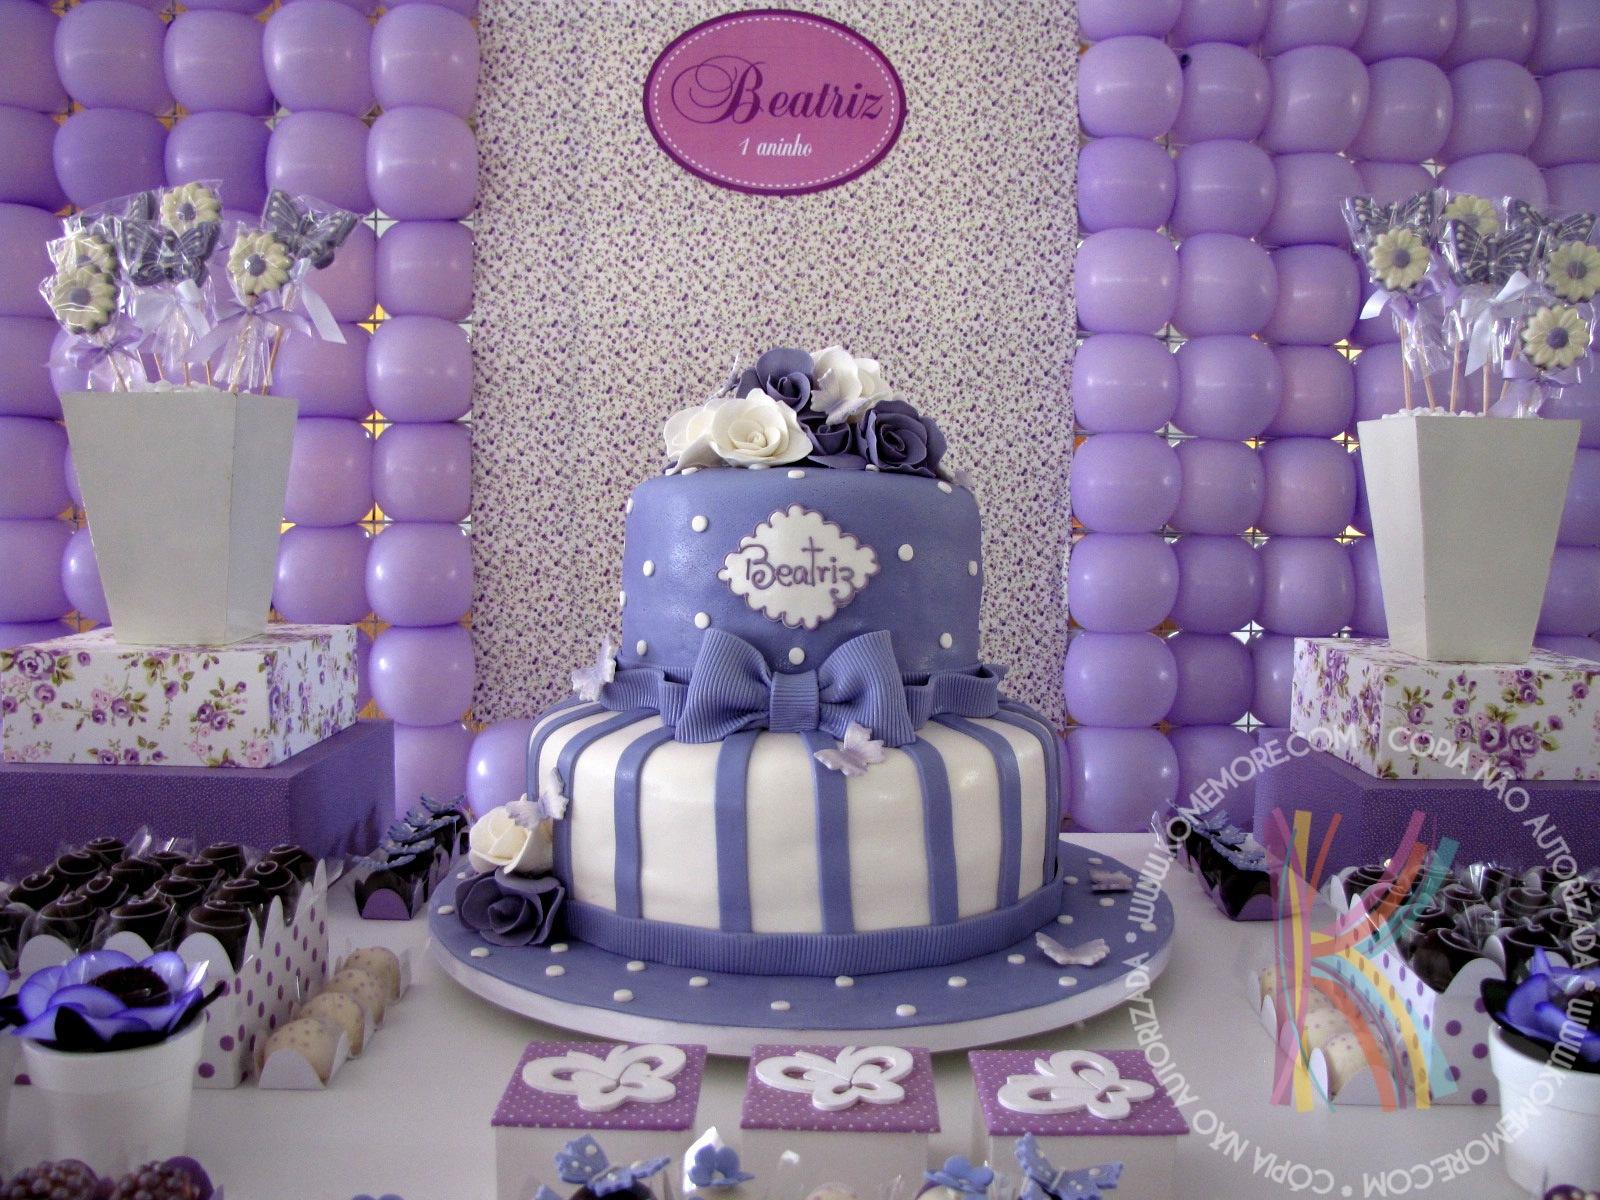 Komemore Festa lilás e branco da Beatriz